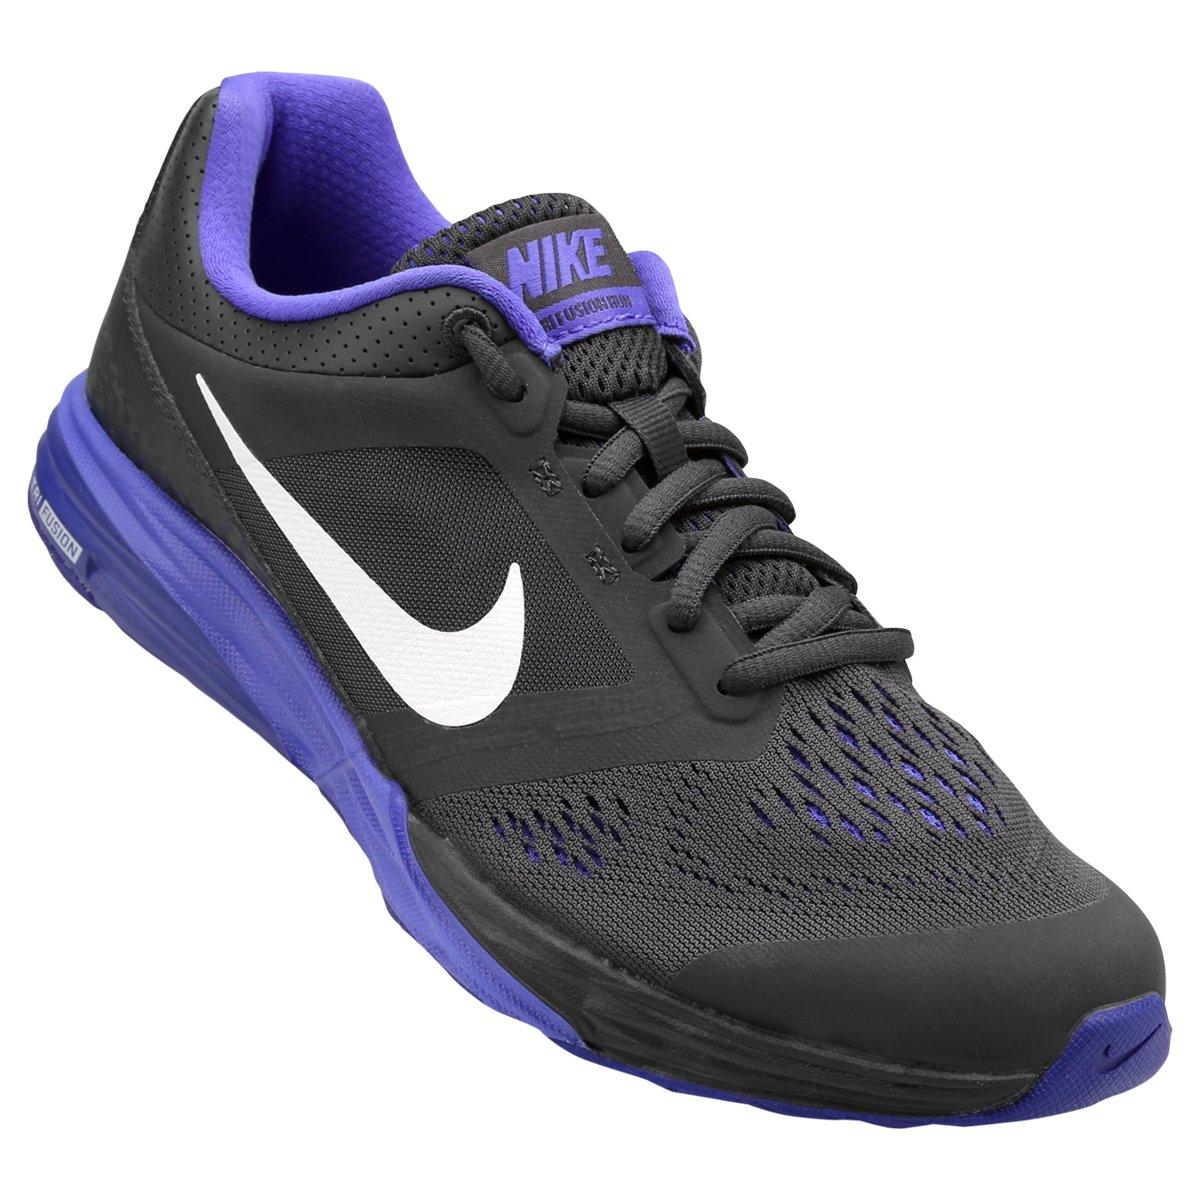 1c1948191b3 Tênis Nike Tri Fusion Run MSL Feminino - Preto e Roxo - Compre Agora ...